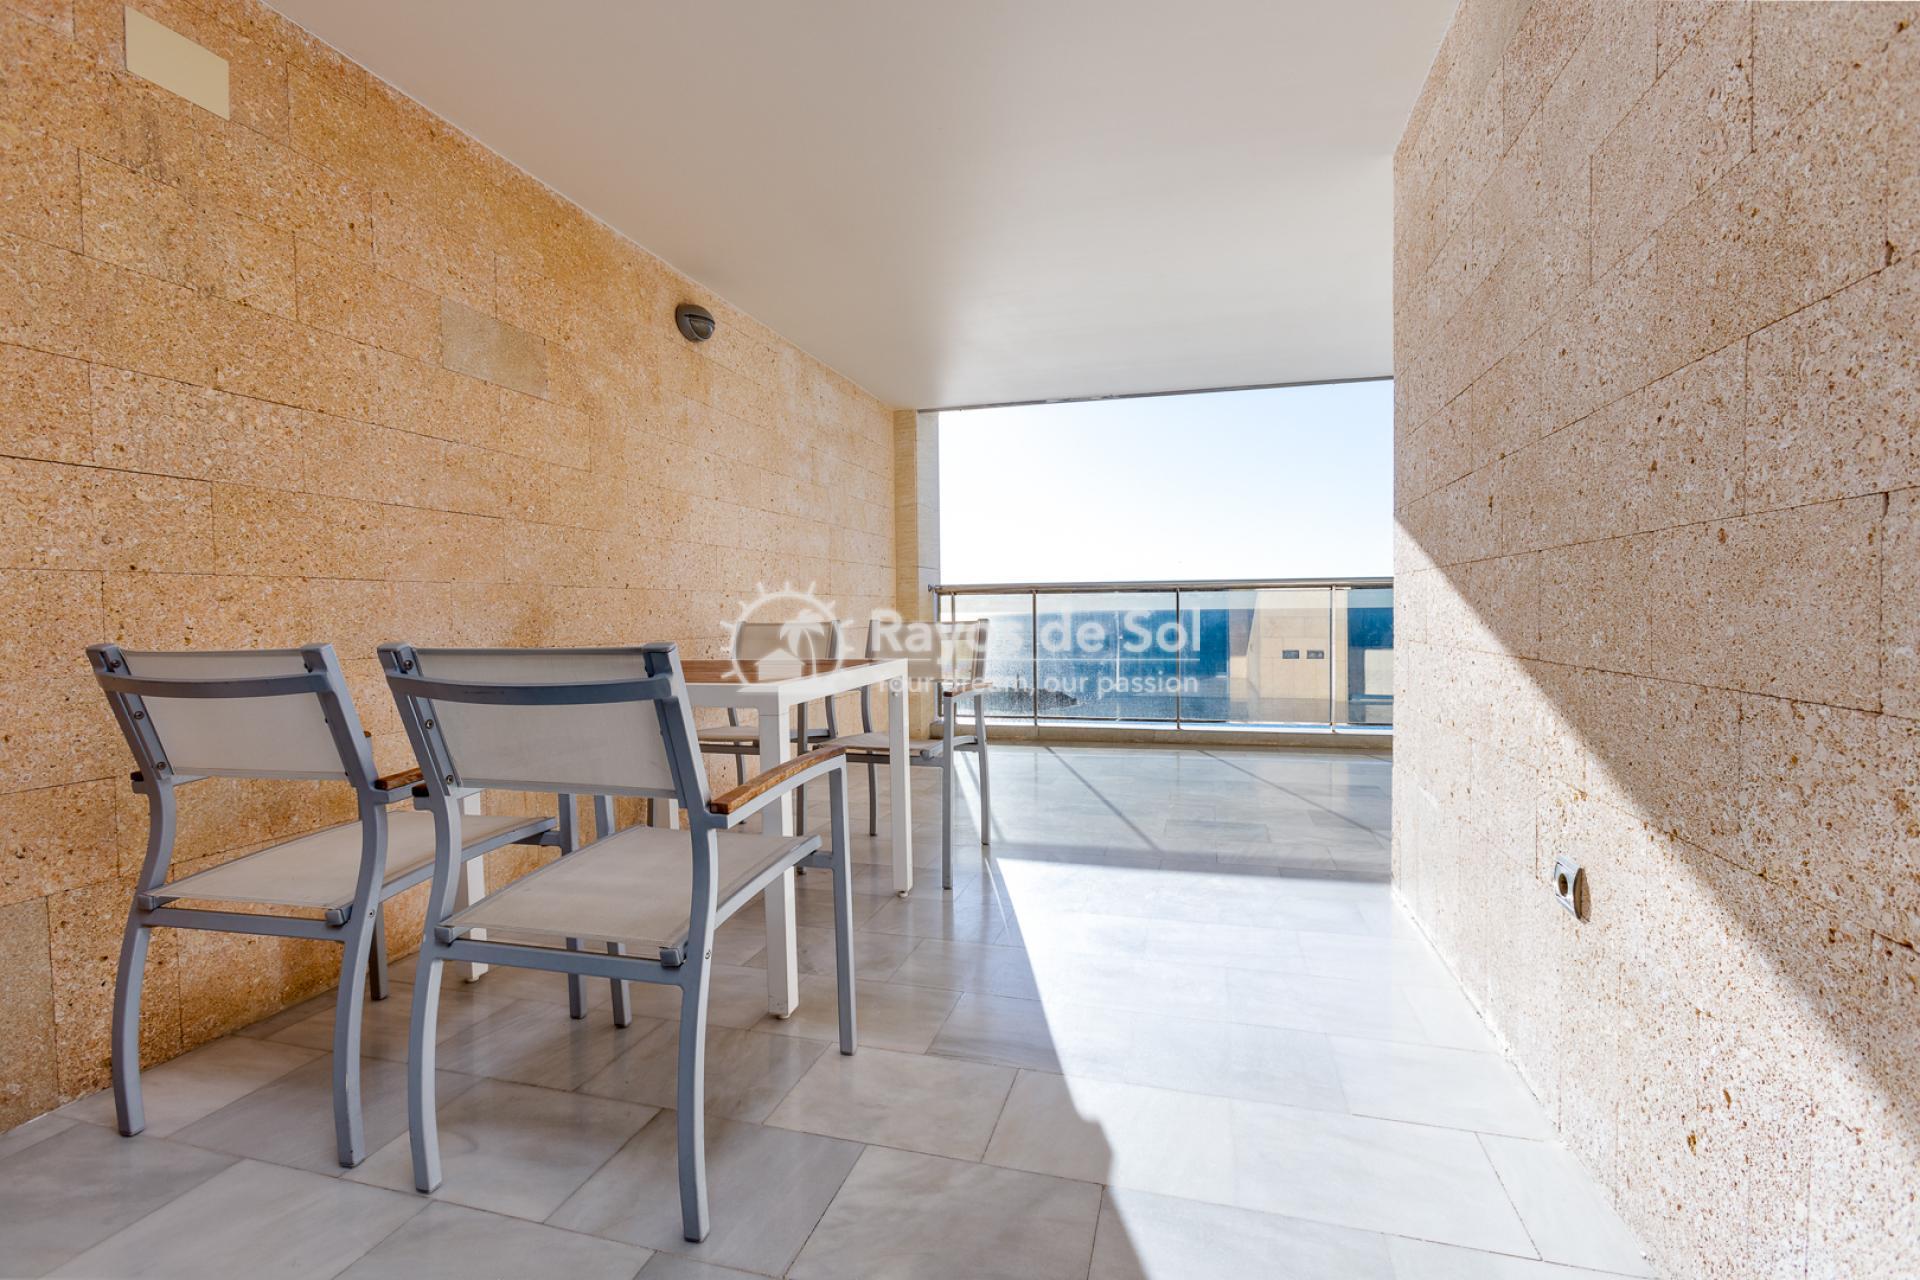 Turnekey first line apartments  in Altea, Costa Blanca (Alteabeach) - 4